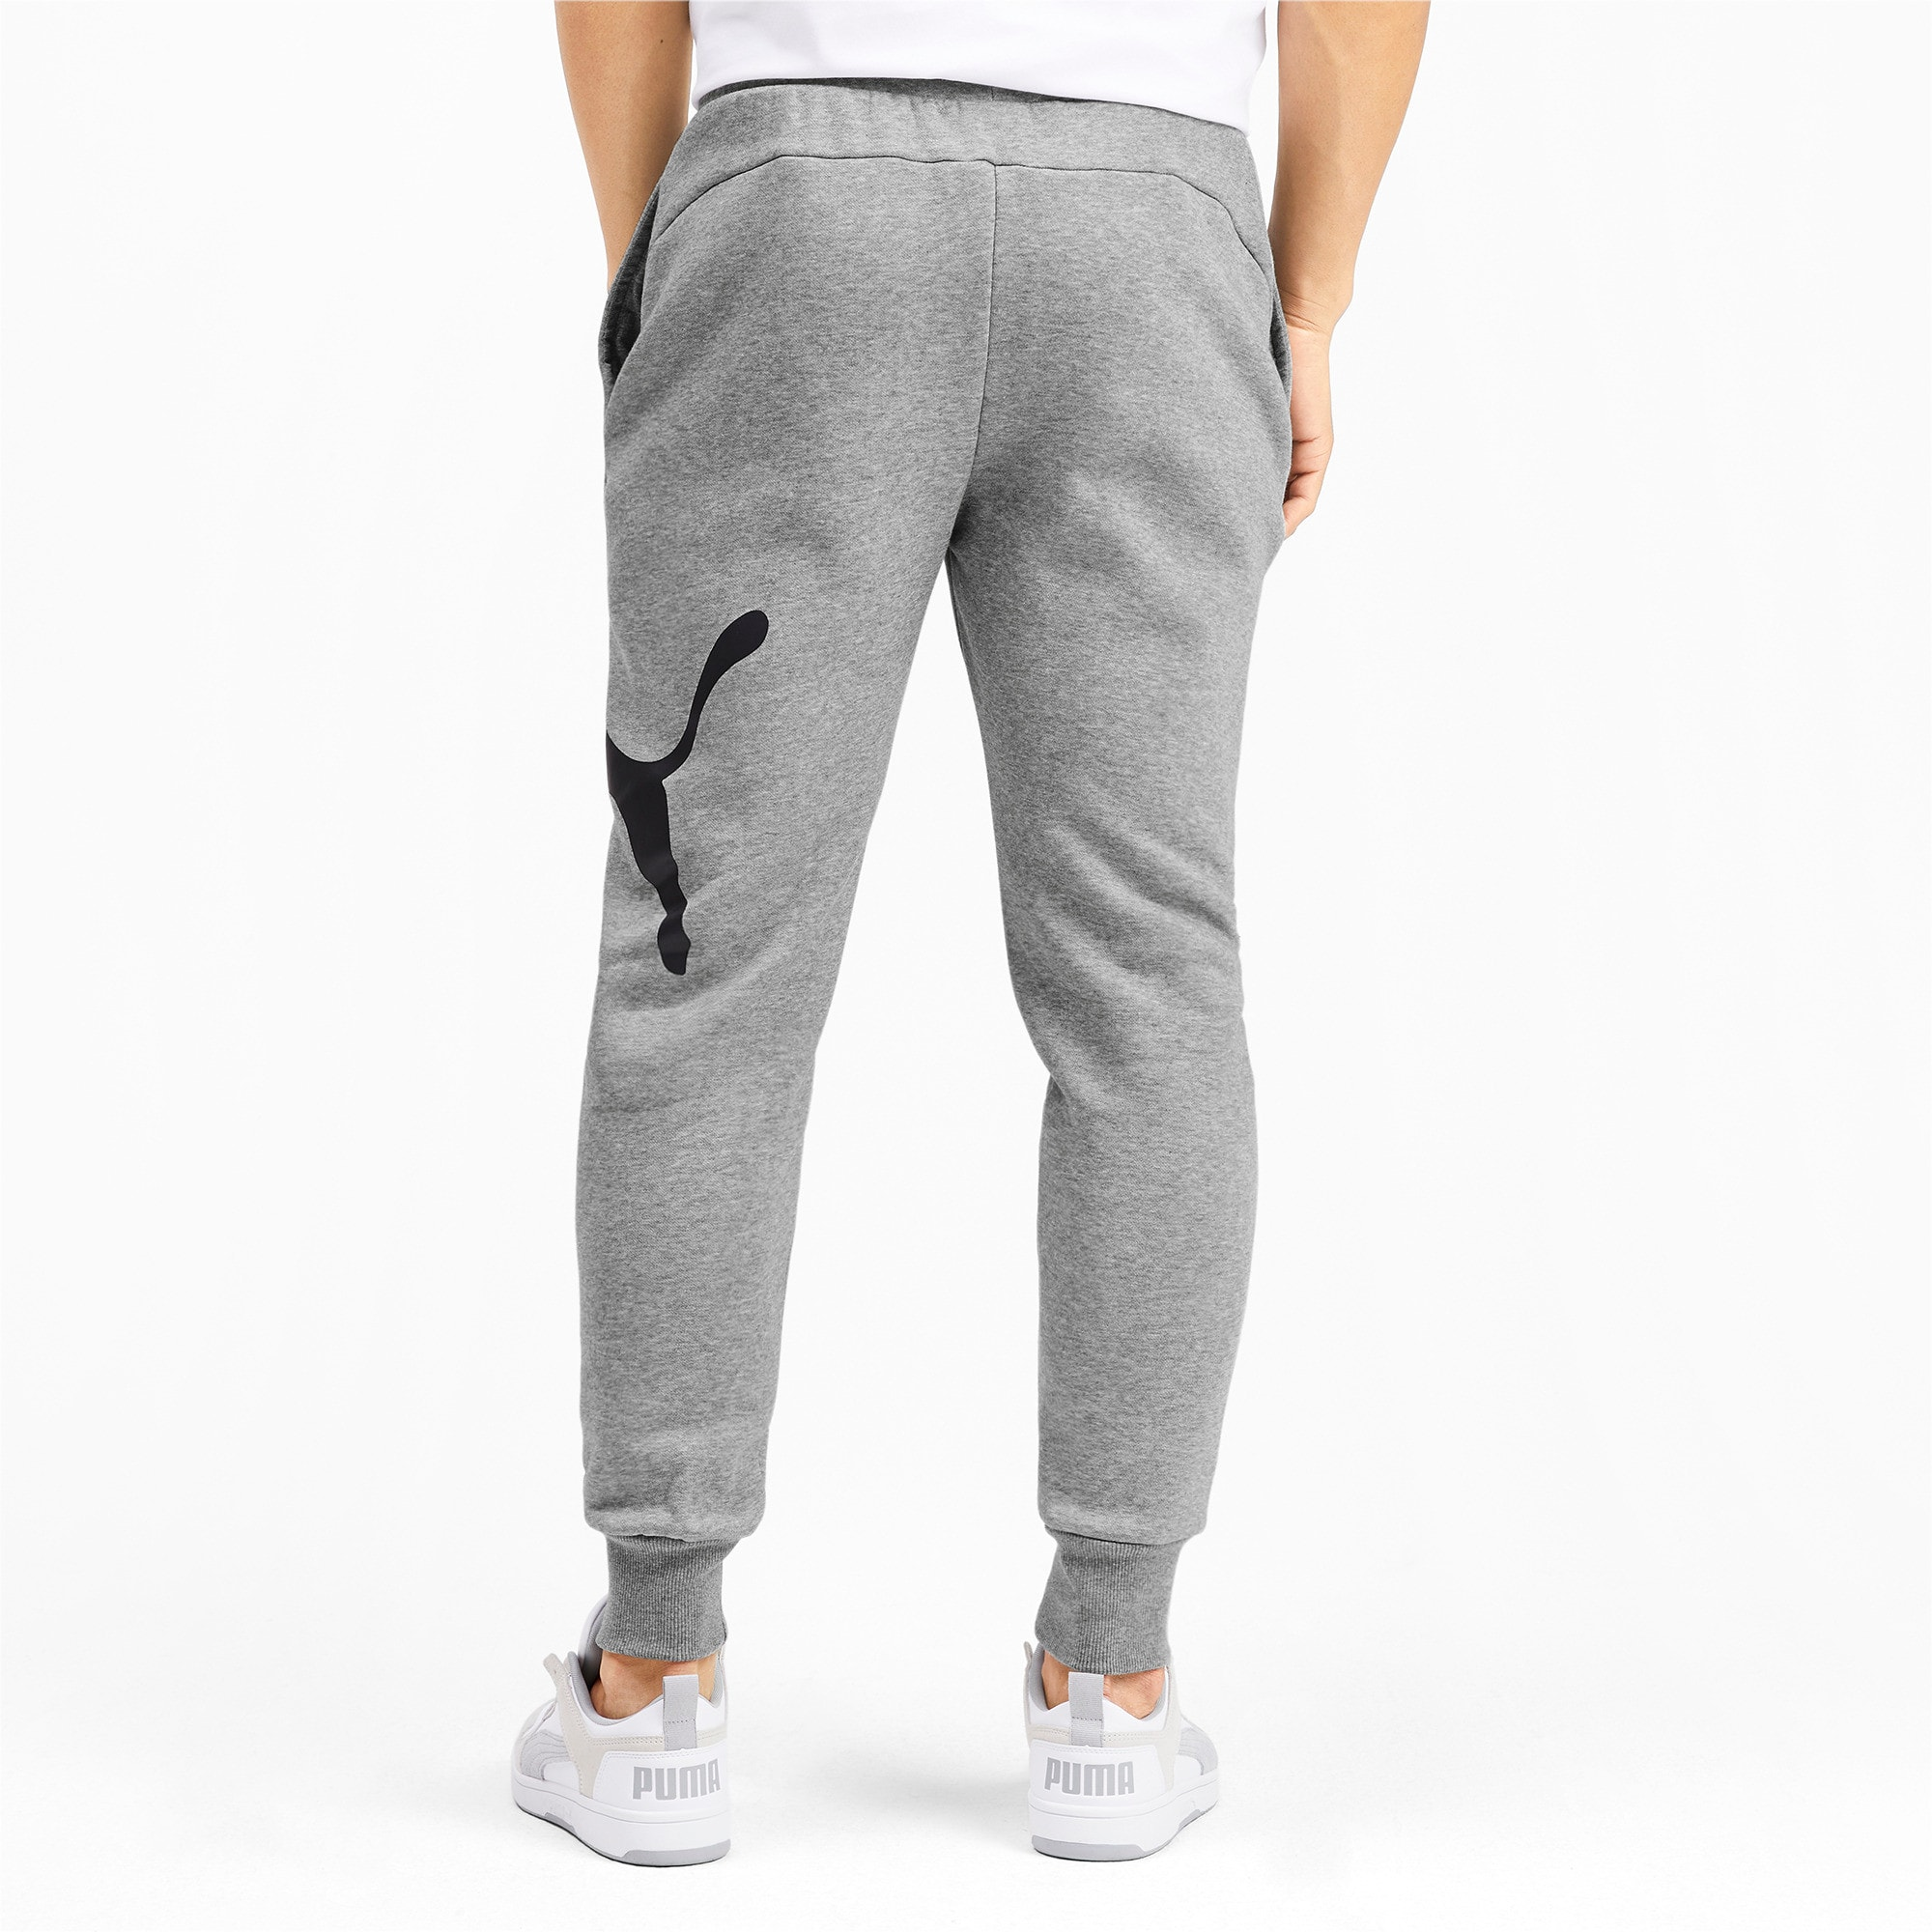 Thumbnail 3 of Men's Big Logo Fleece Sweatpants, Medium Gray Heather, medium